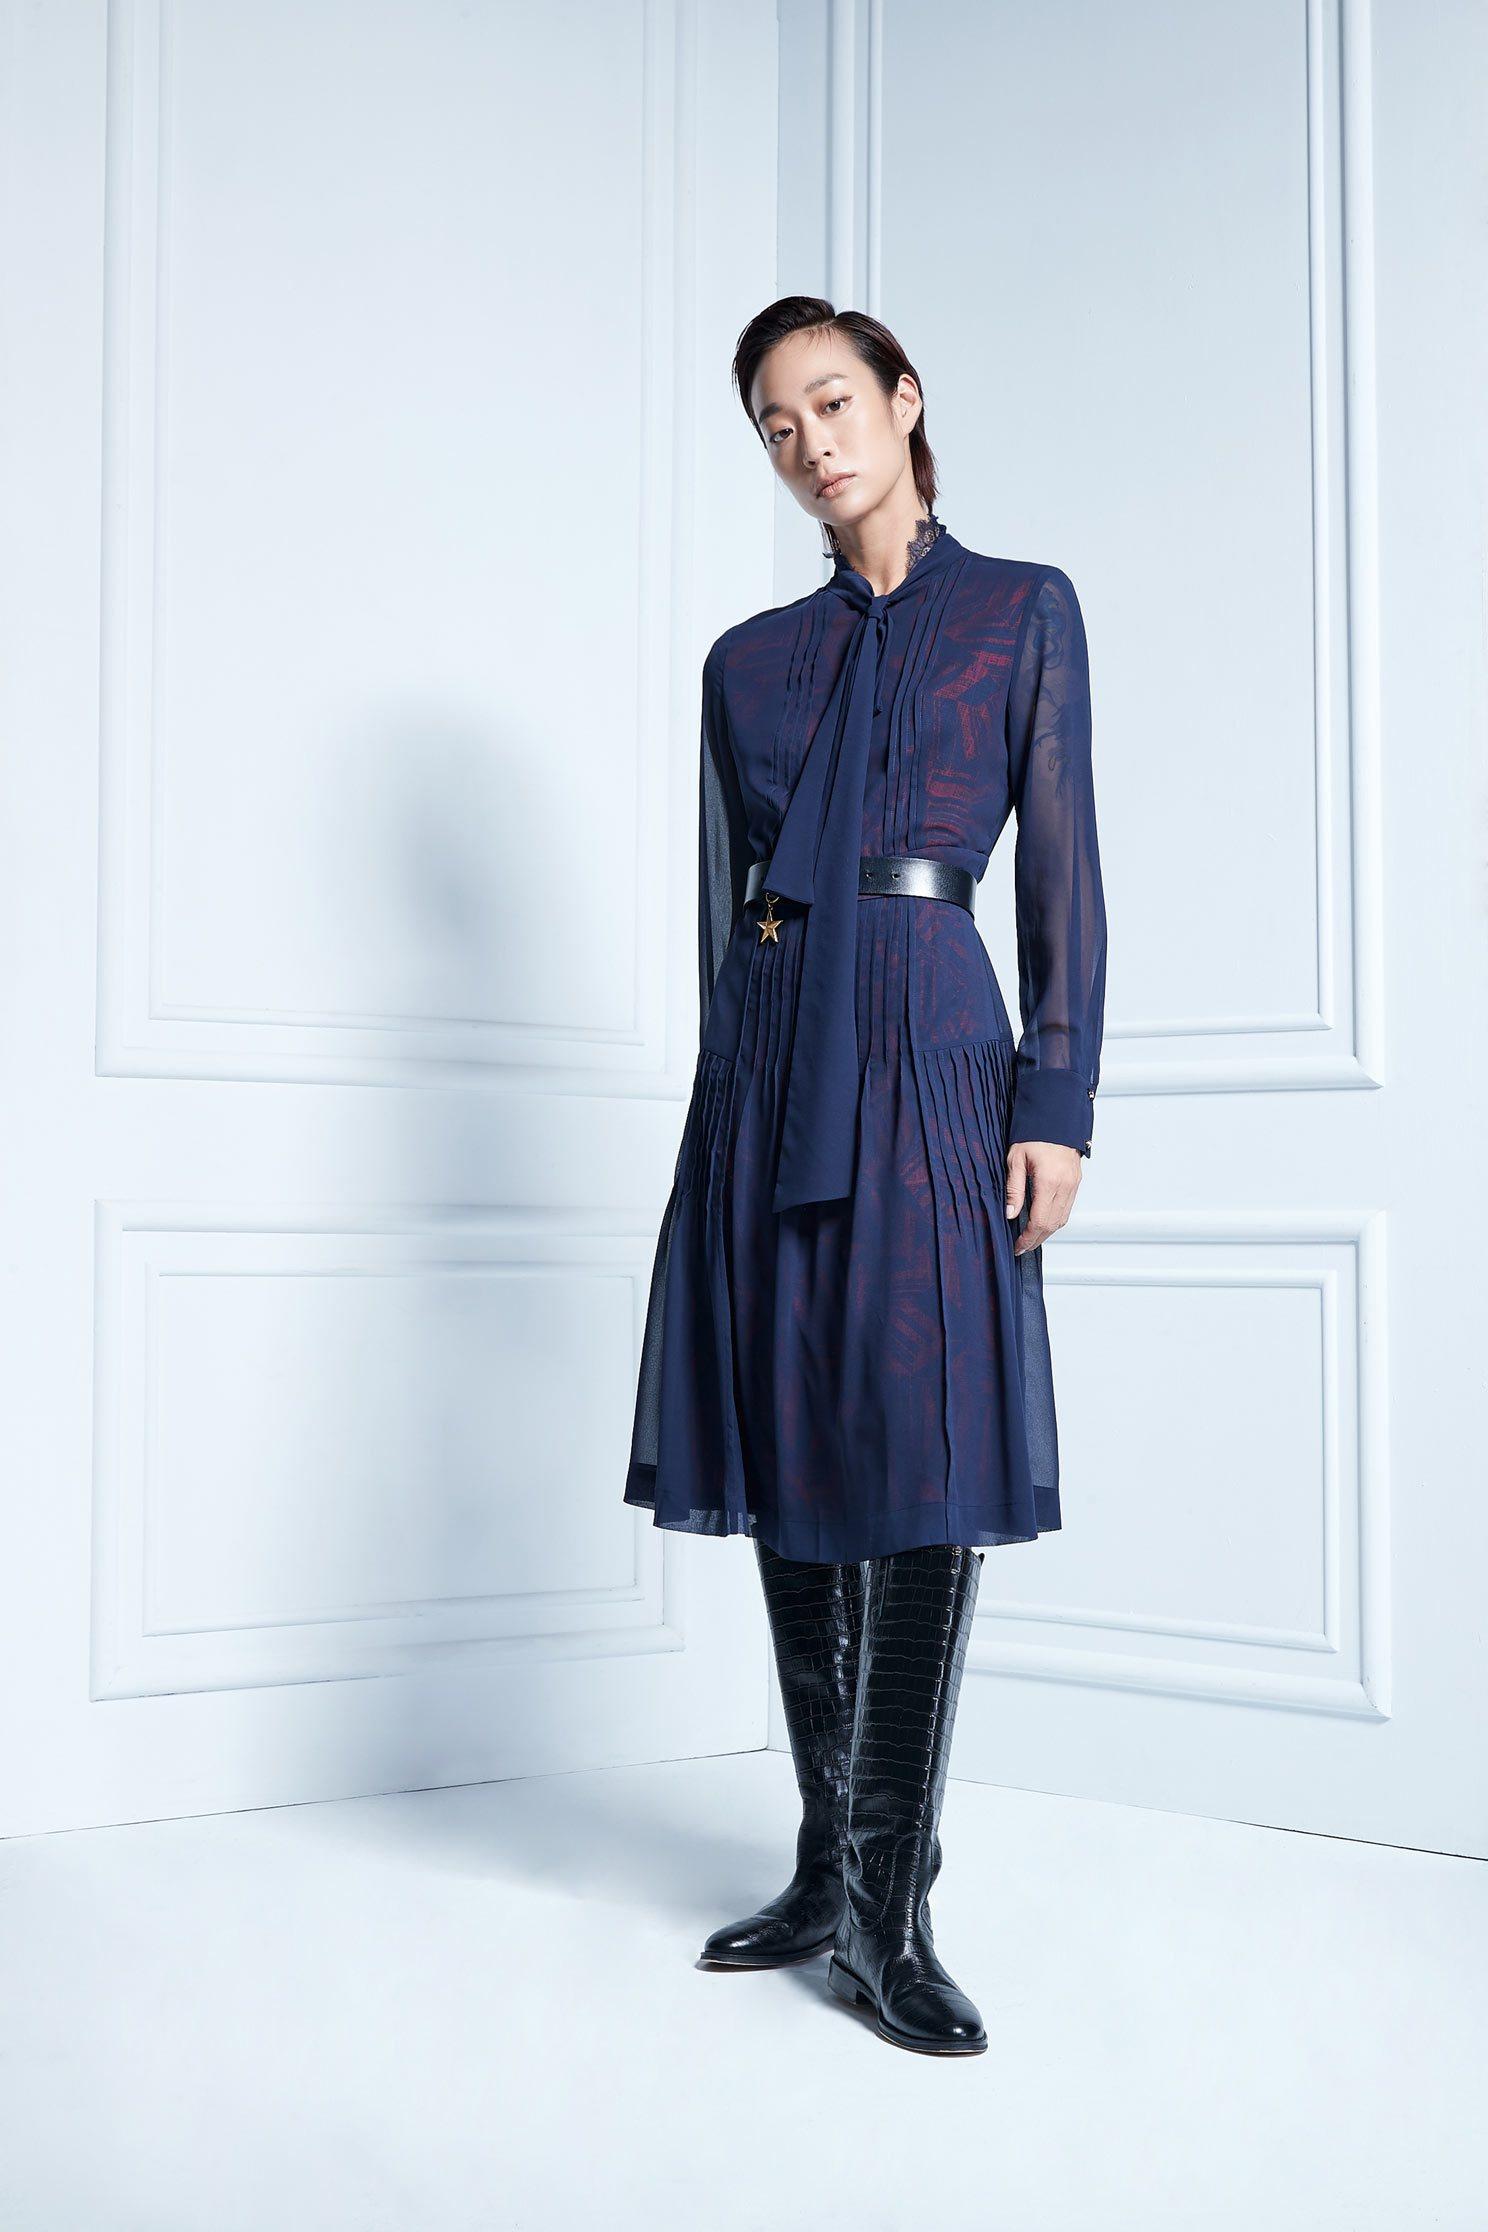 Navy blue chiffon printed dress